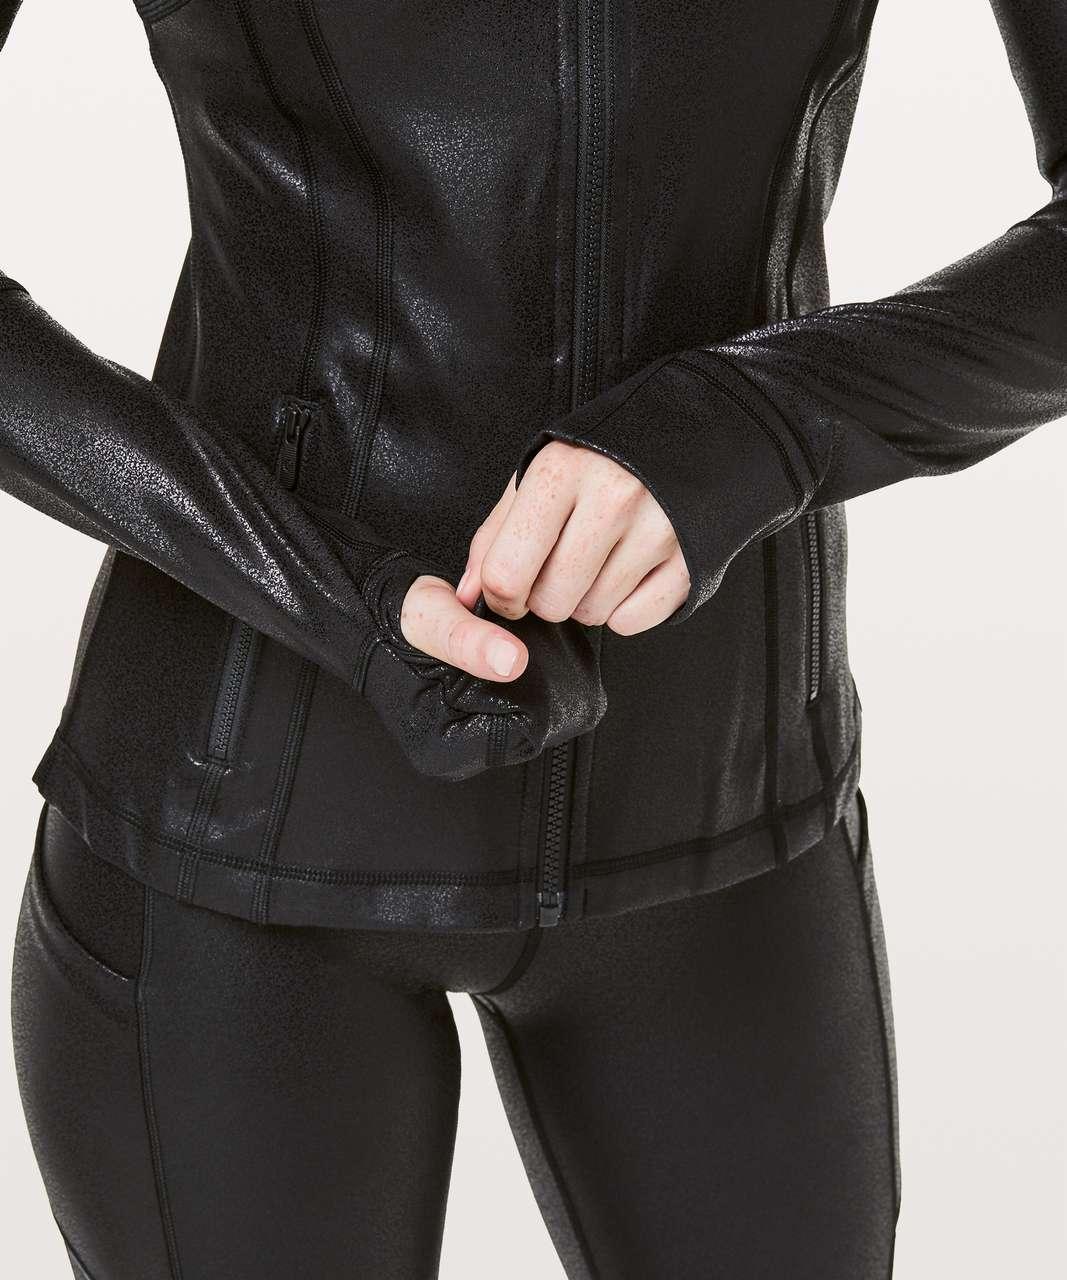 Lululemon Define Jacket *Foil - Luminosity Foil Print Black Black